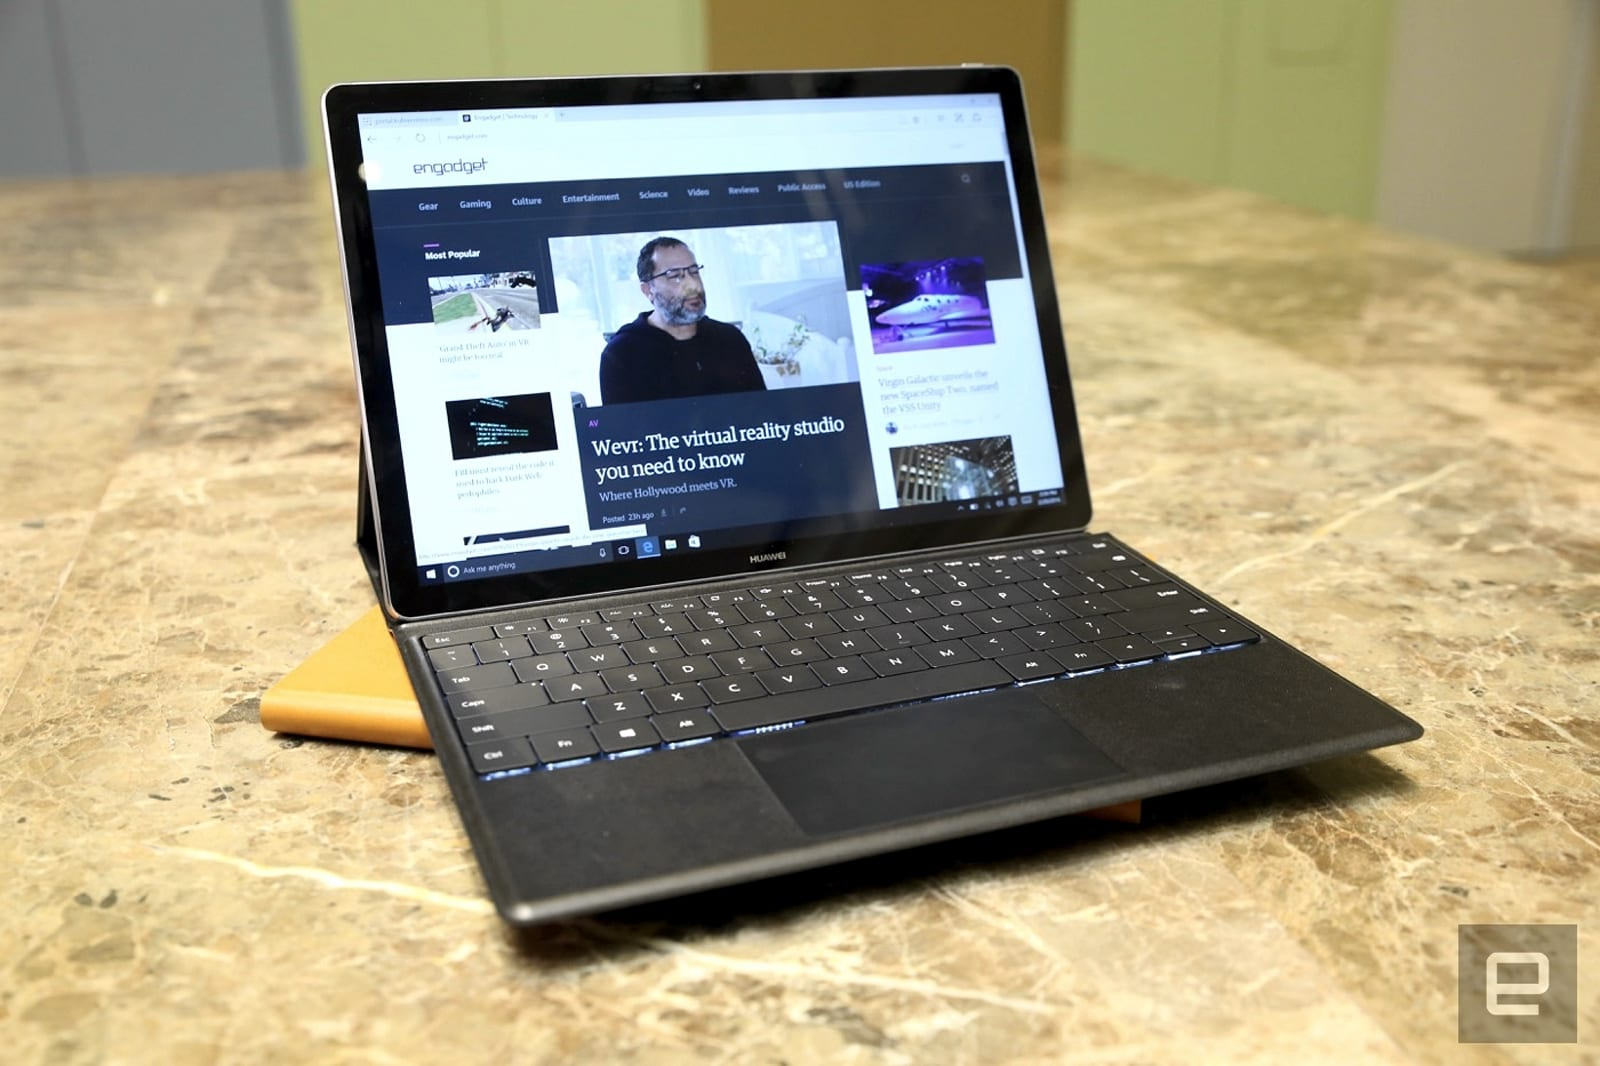 Huawei's MateBook is beautiful, but fundamentally flawed